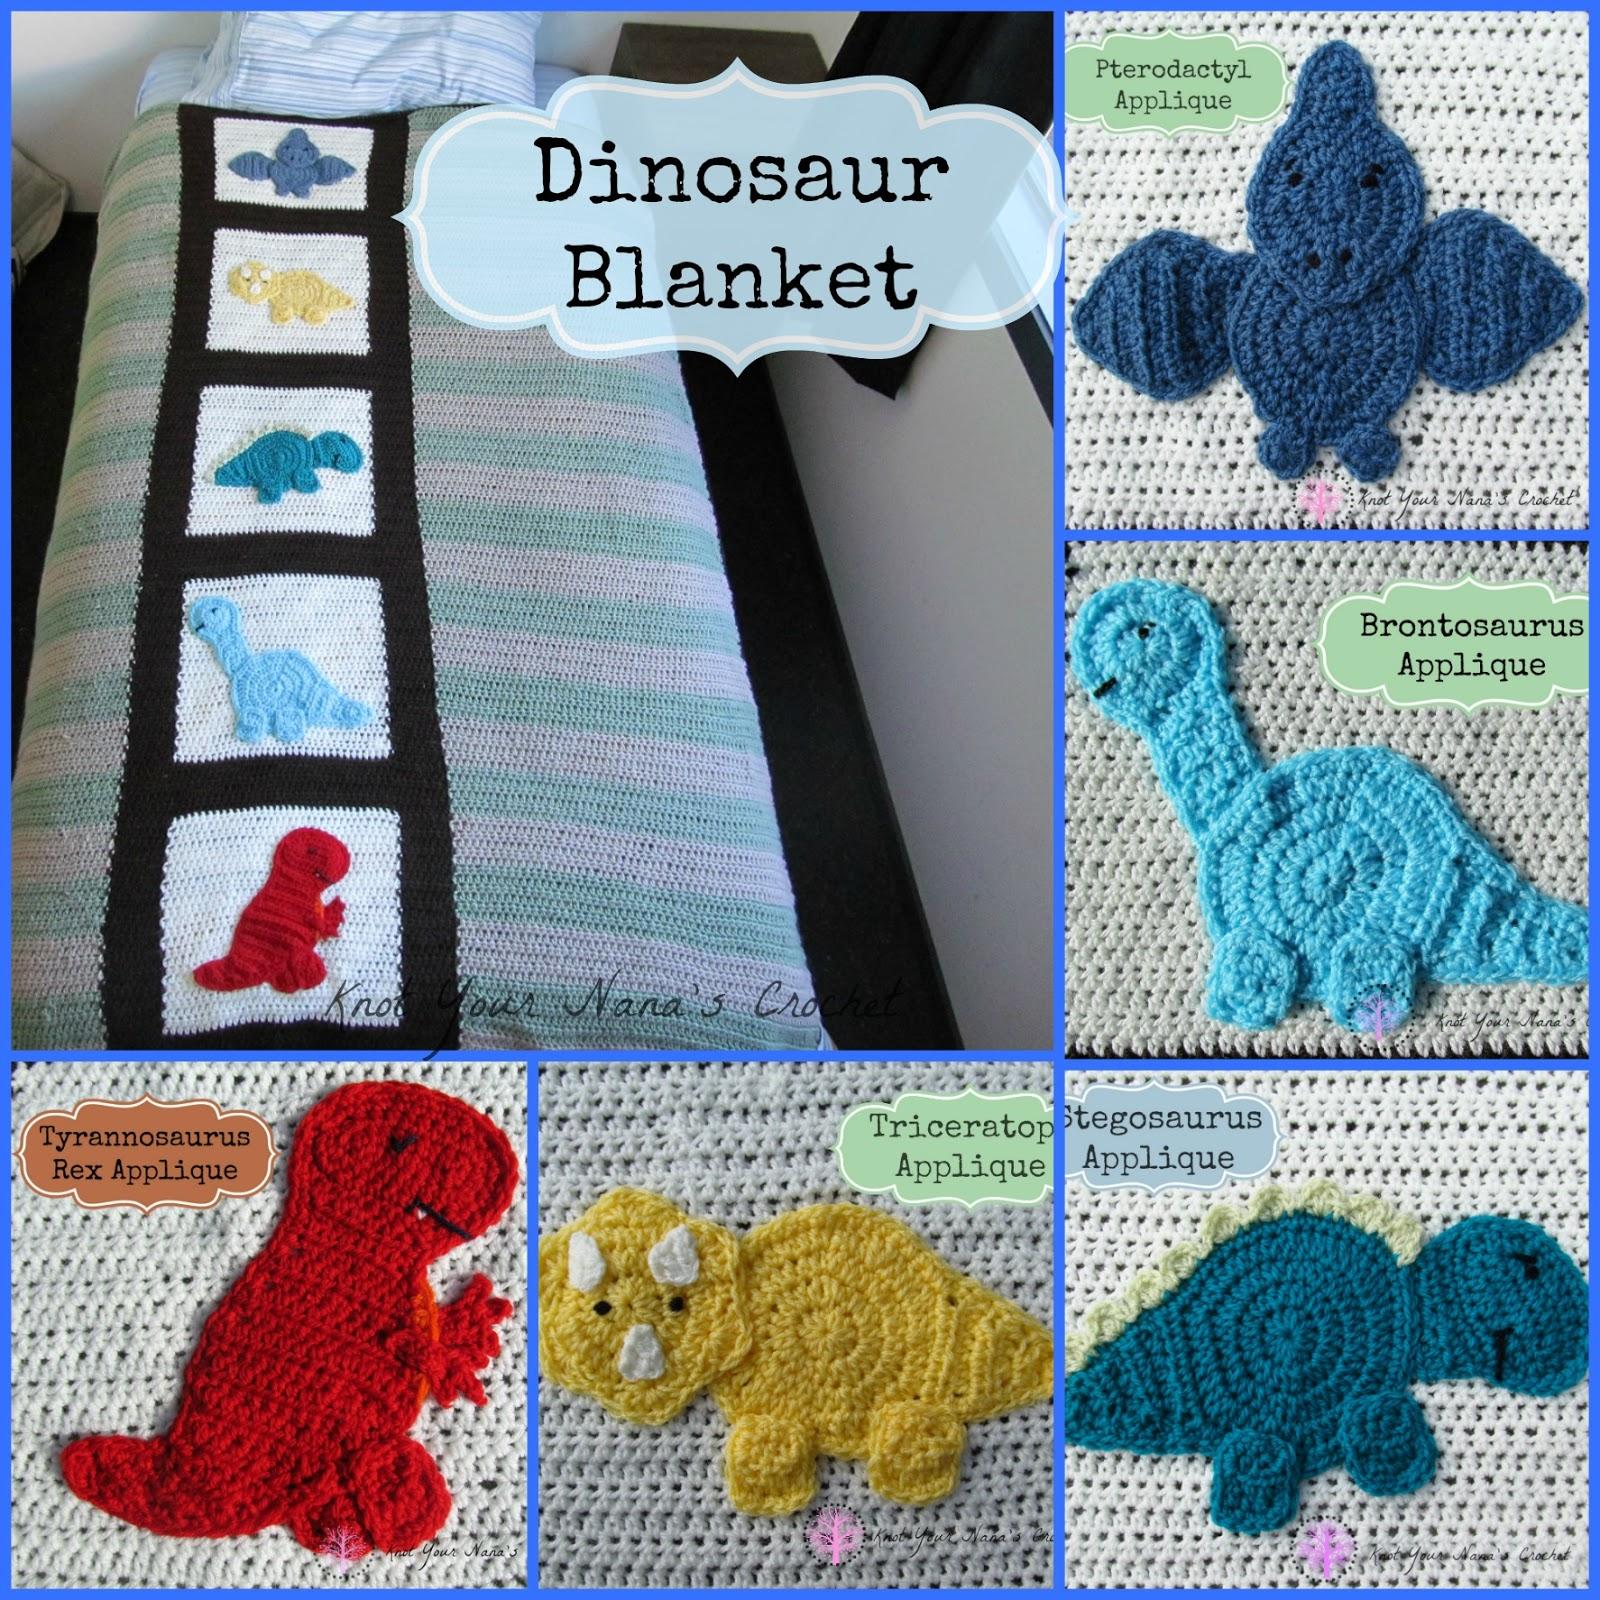 Baby Dinosaur Knitting Pattern : Knot Your Nanas Crochet: Crochet Dinosaur Blanket